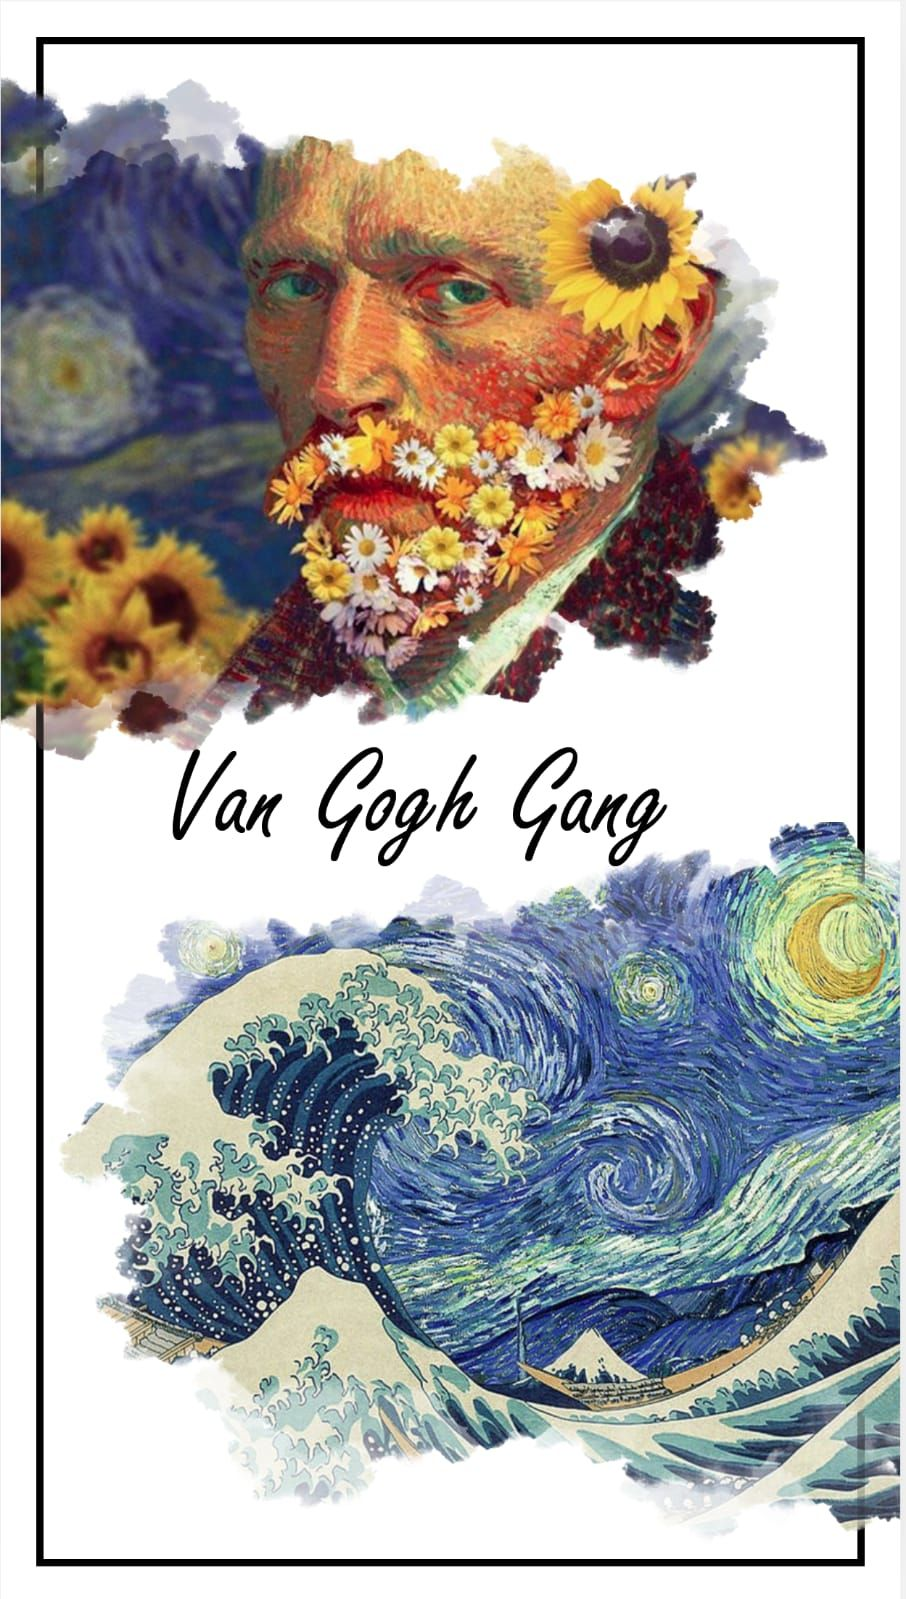 Van Gogh Gang phone wallpaper